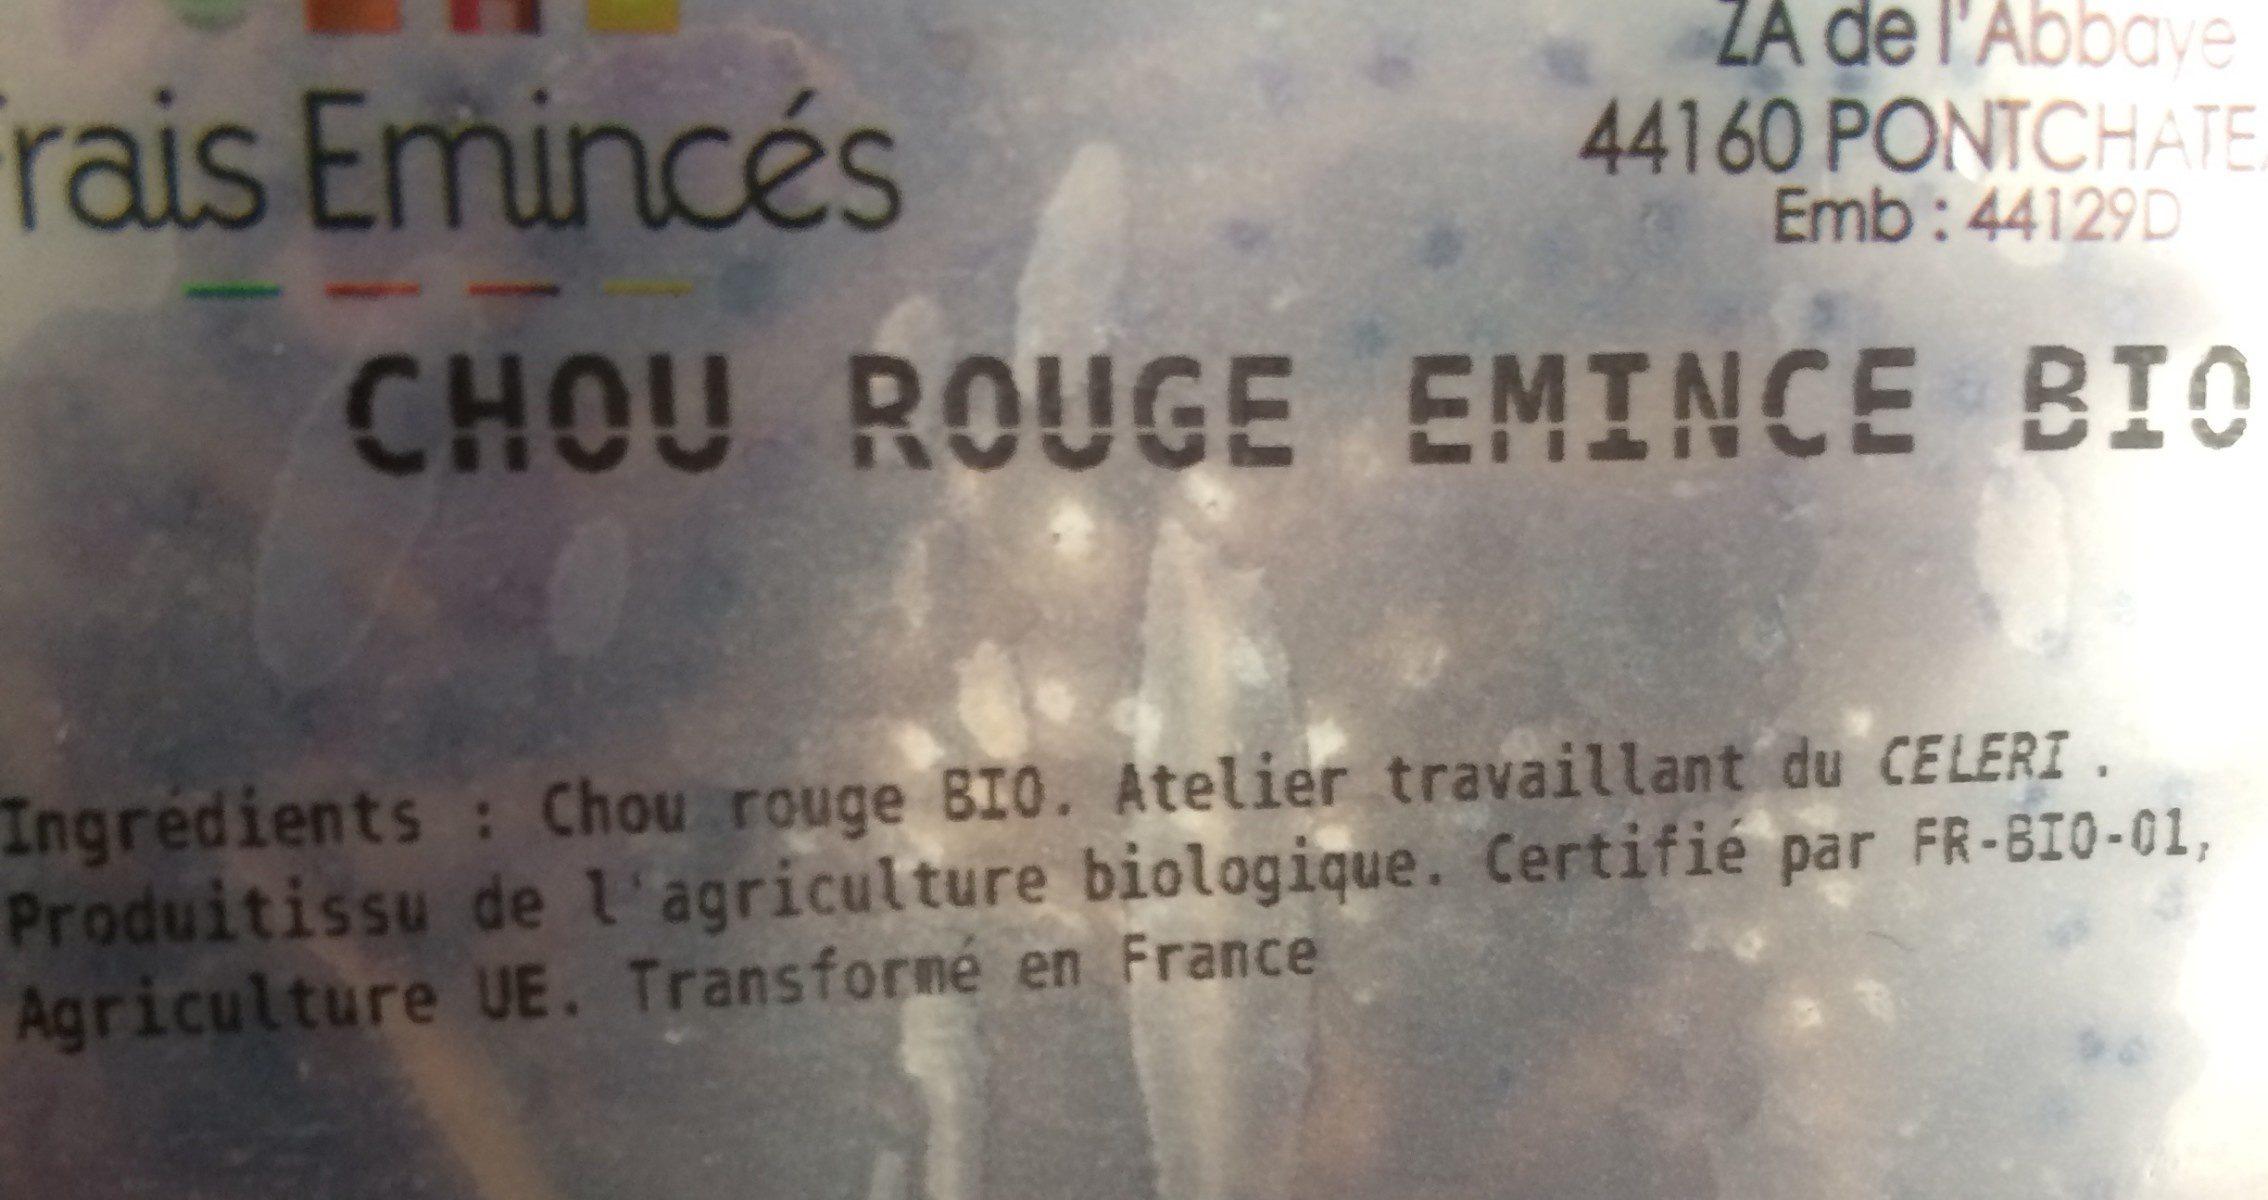 Chou rouge émincé bio Frais Emincés - Ingrediënten